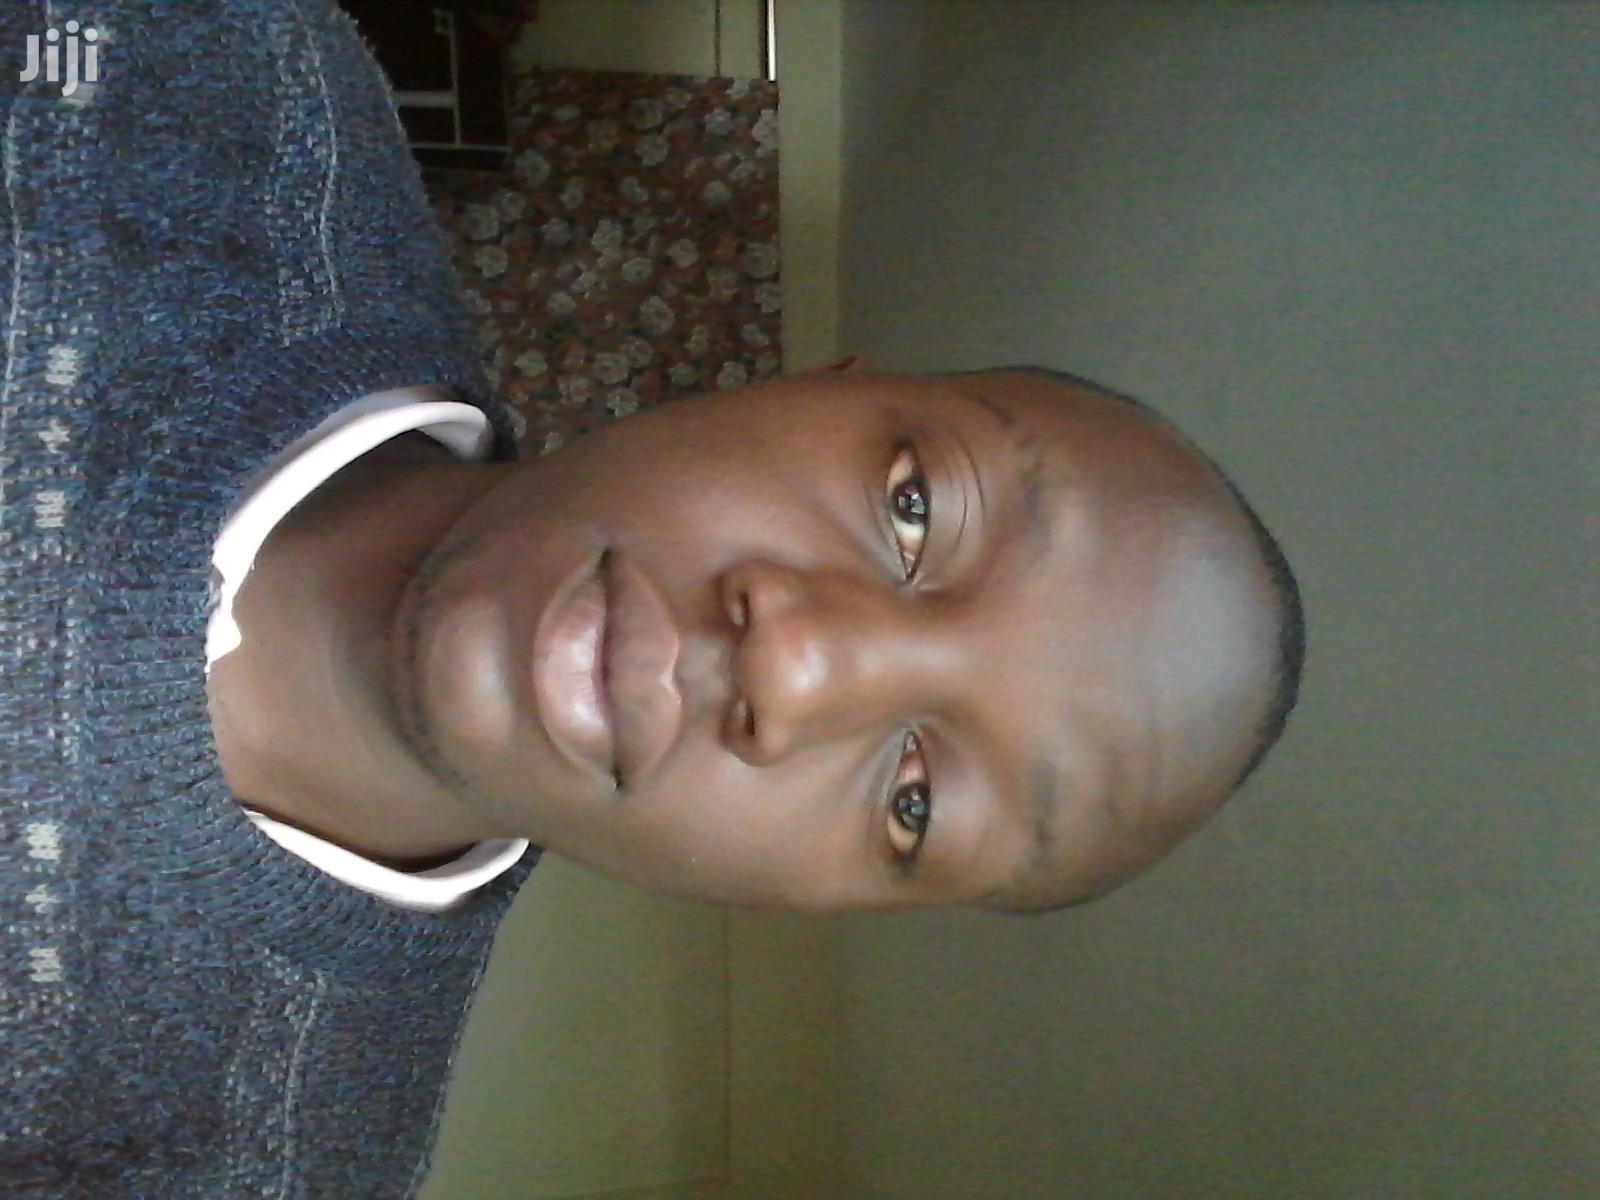 Driver CV | Driver CVs for sale in Zimmerman, Nairobi, Kenya